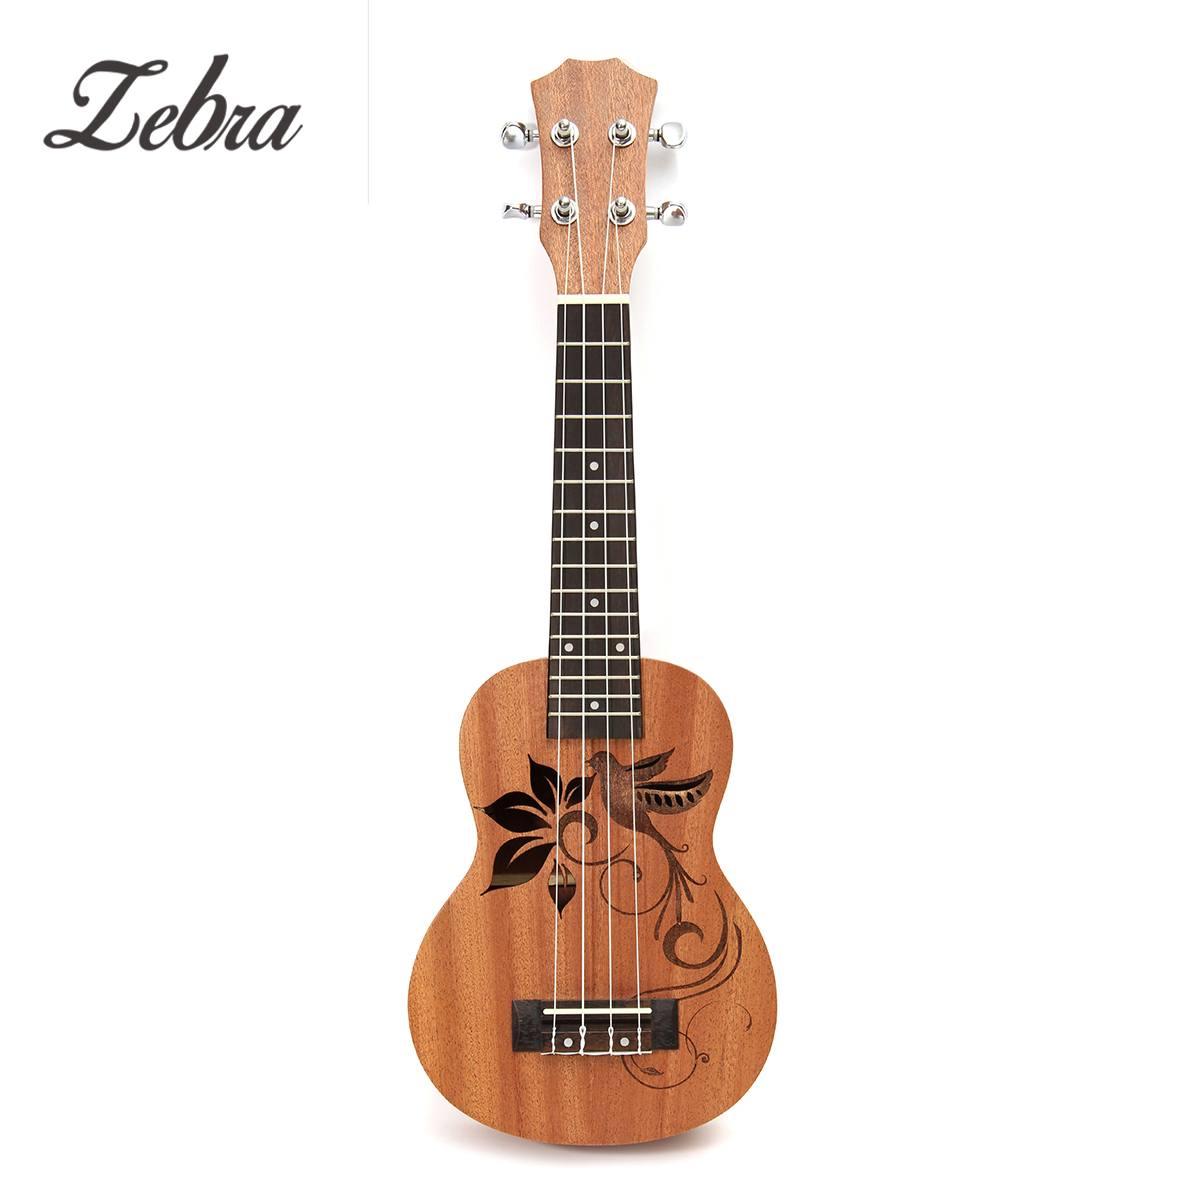 Zebra21 Inch 15 Frets  Spring Mahogany Soprano Ukulele Guitar Sapele Rosewood 4 Strings Hawaiian Guitar Musical Instruments